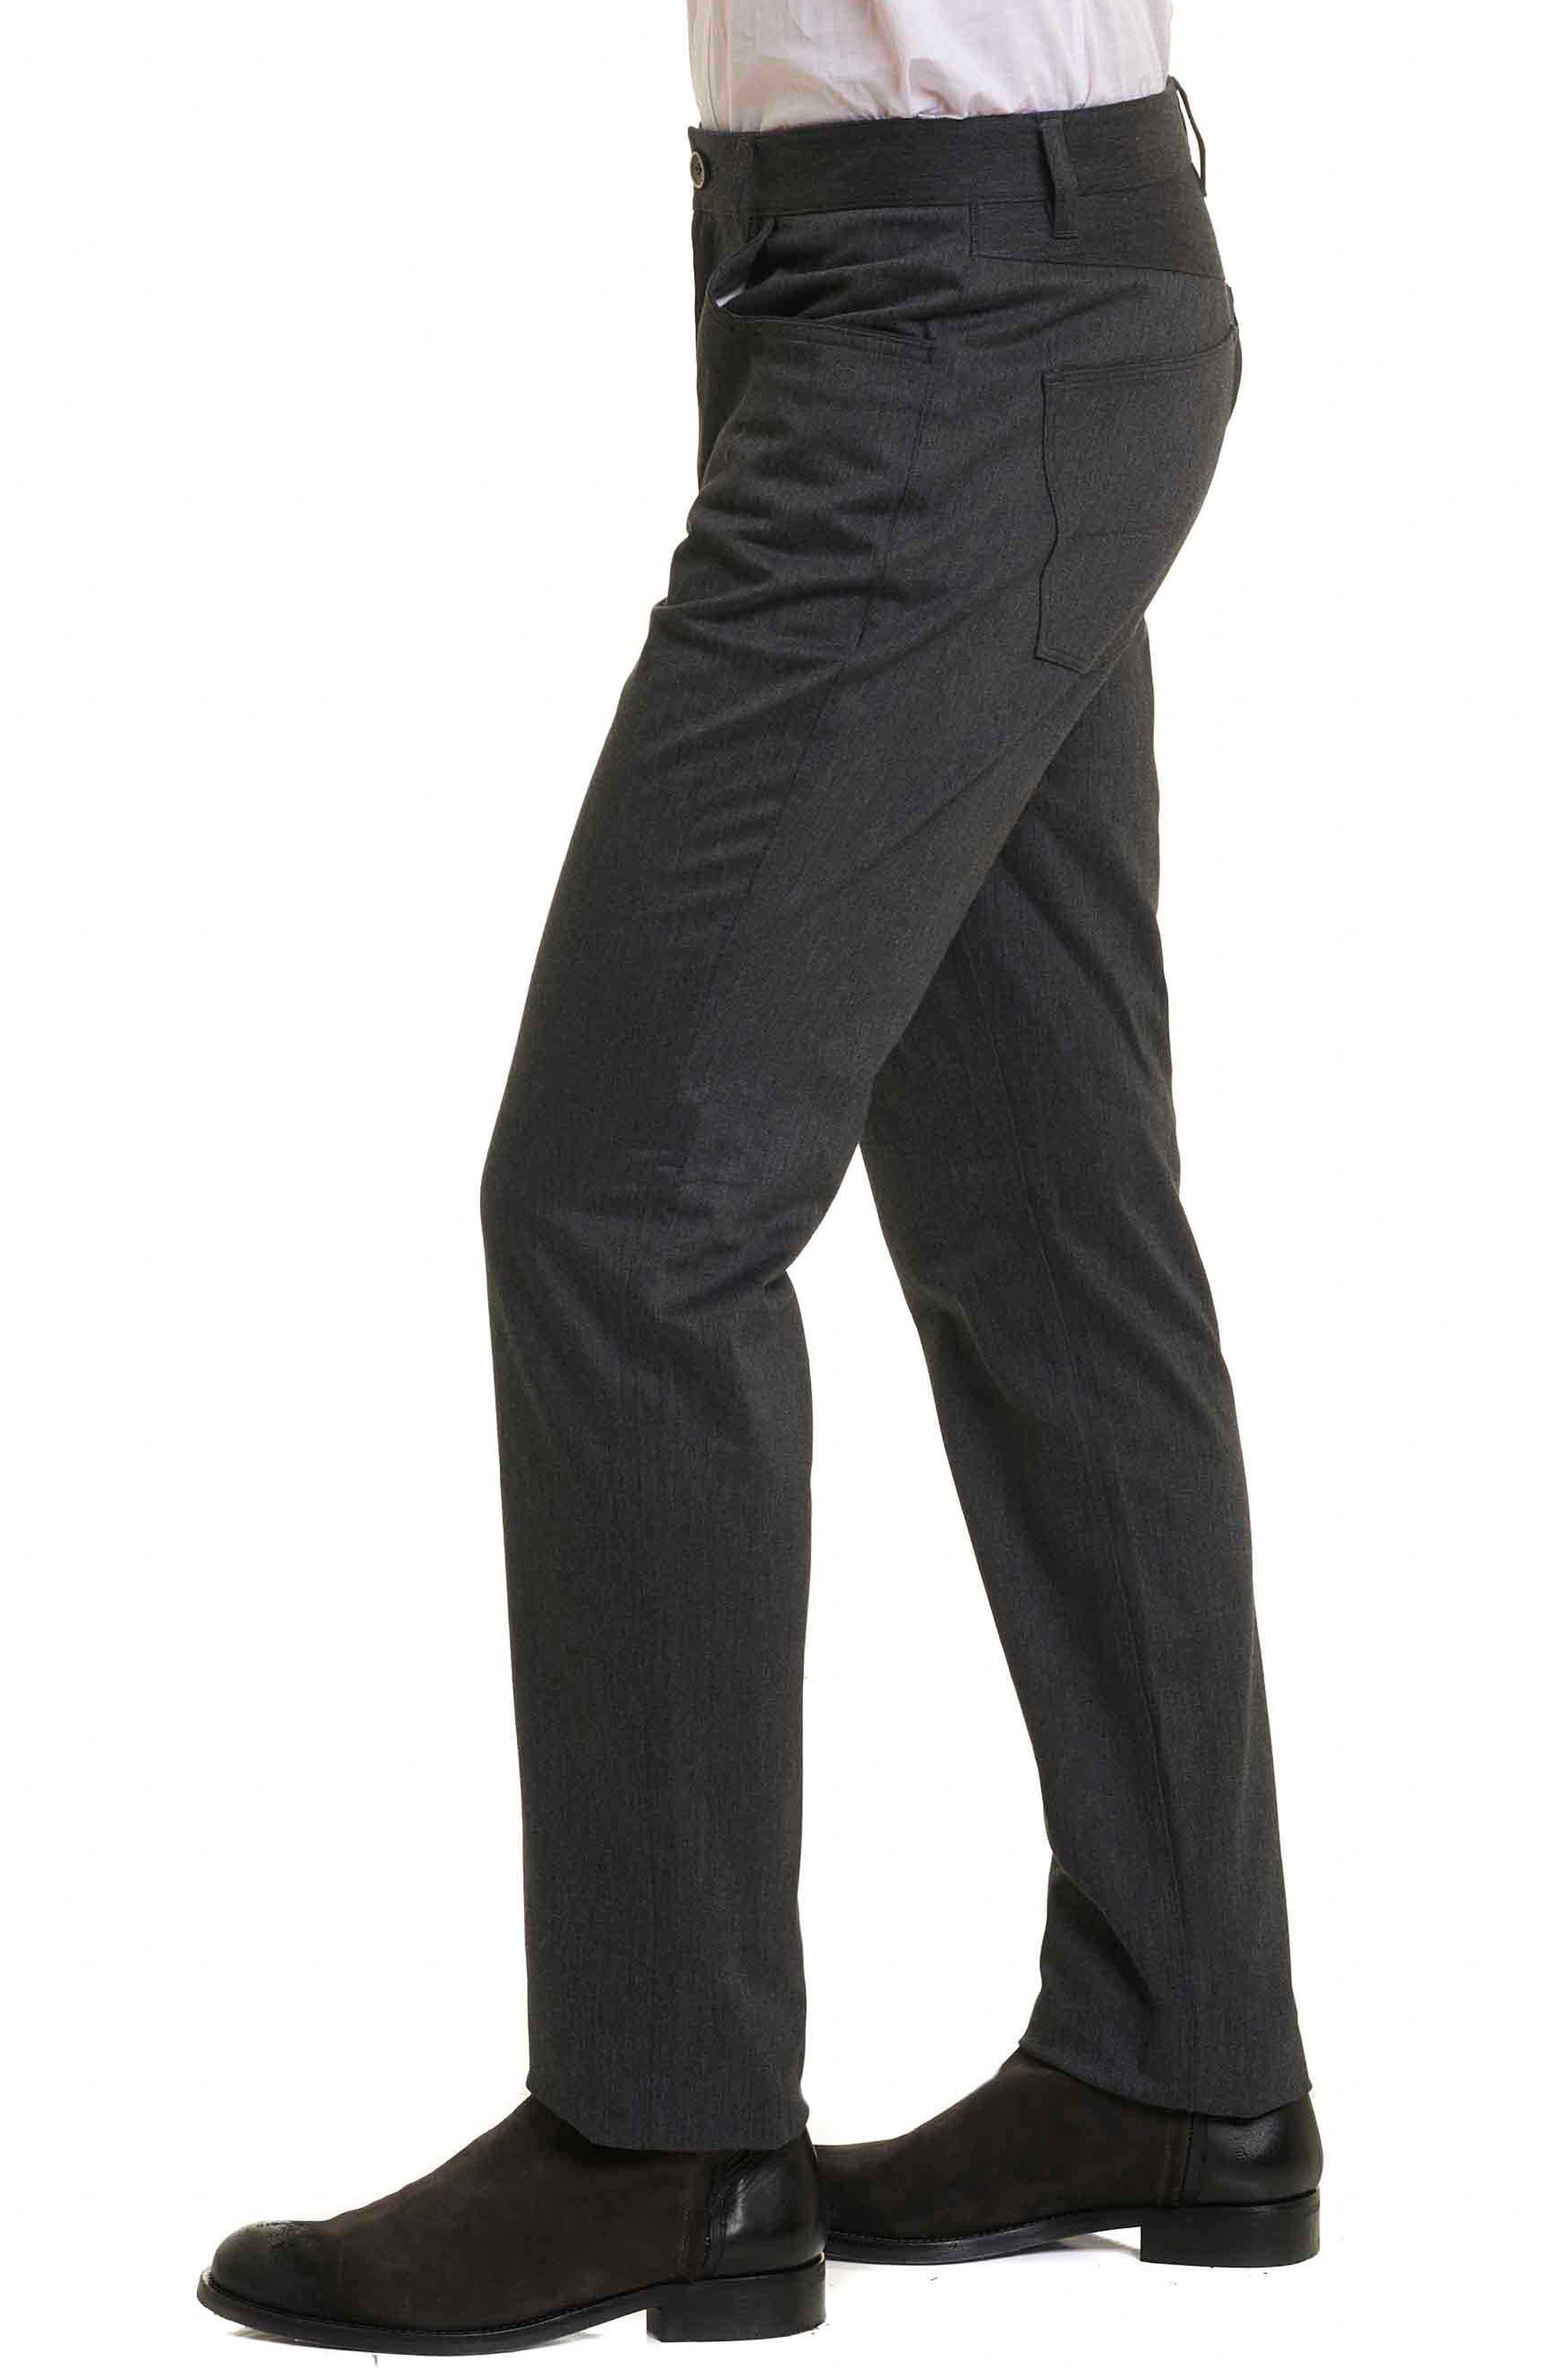 Tanner Five-Pocket Pants,                         Main,                         color, 050